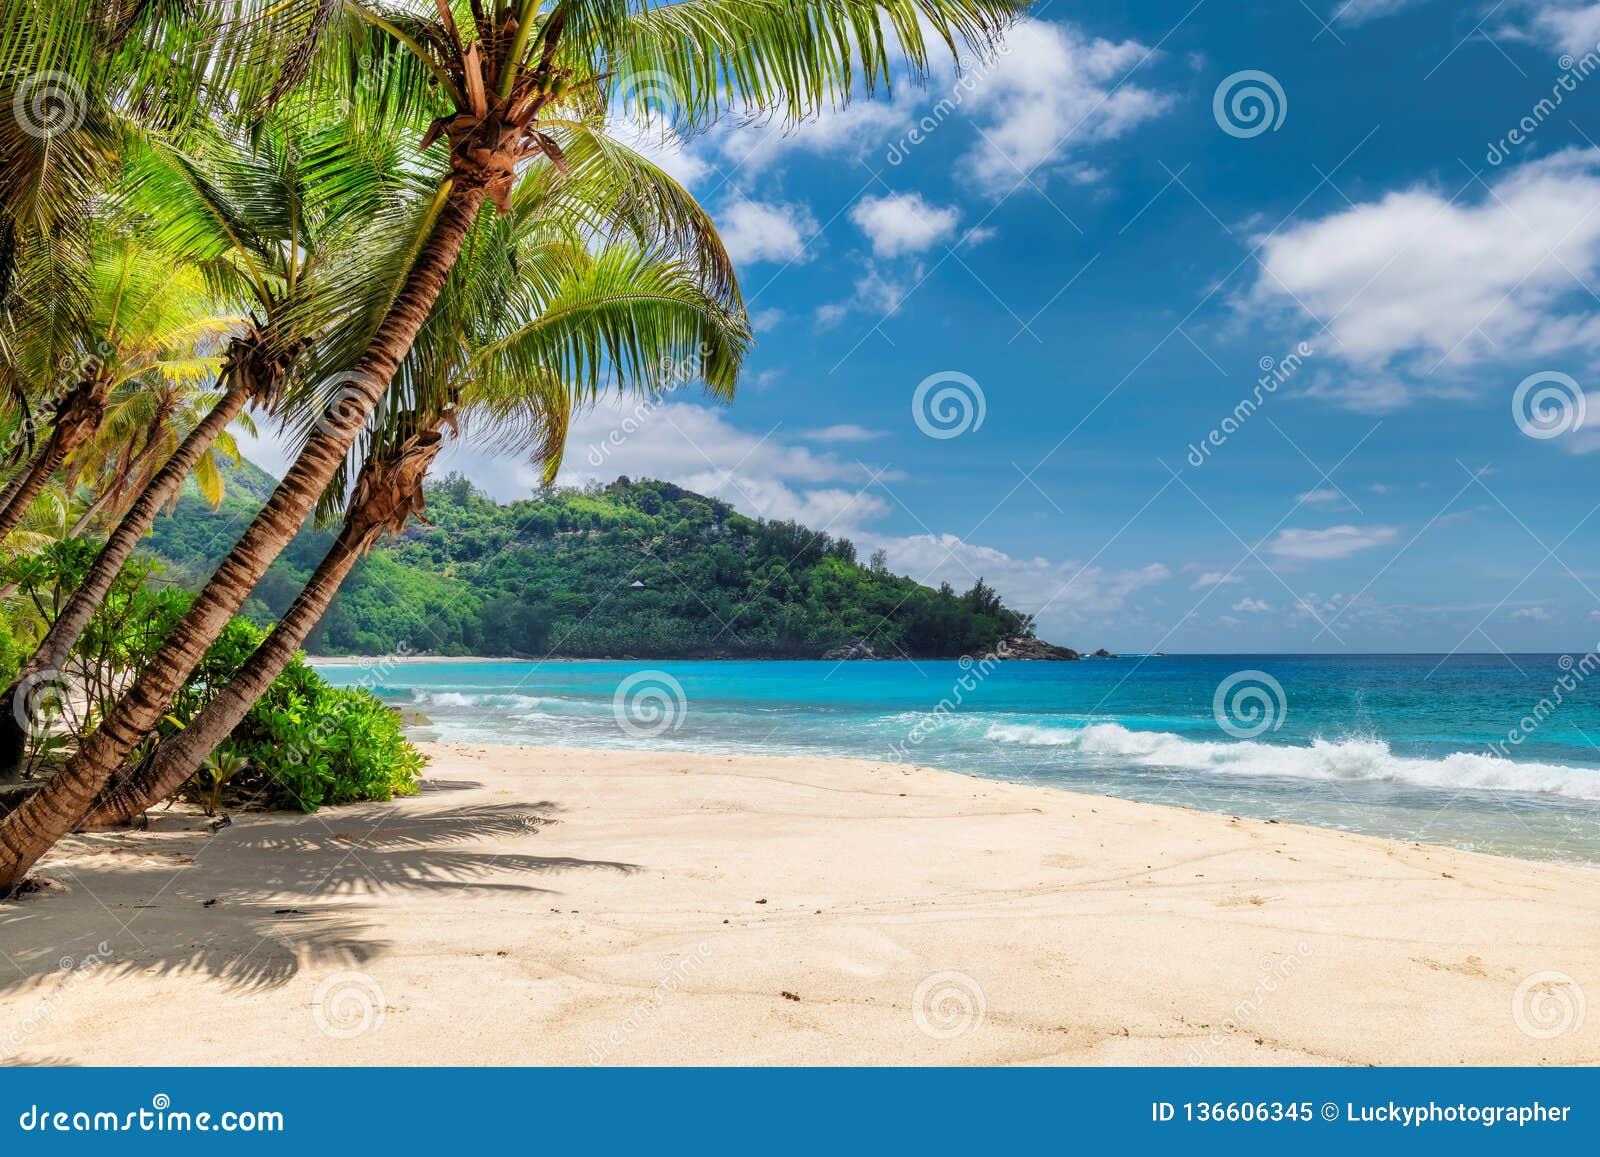 Palmen en tropisch strand met wit zand